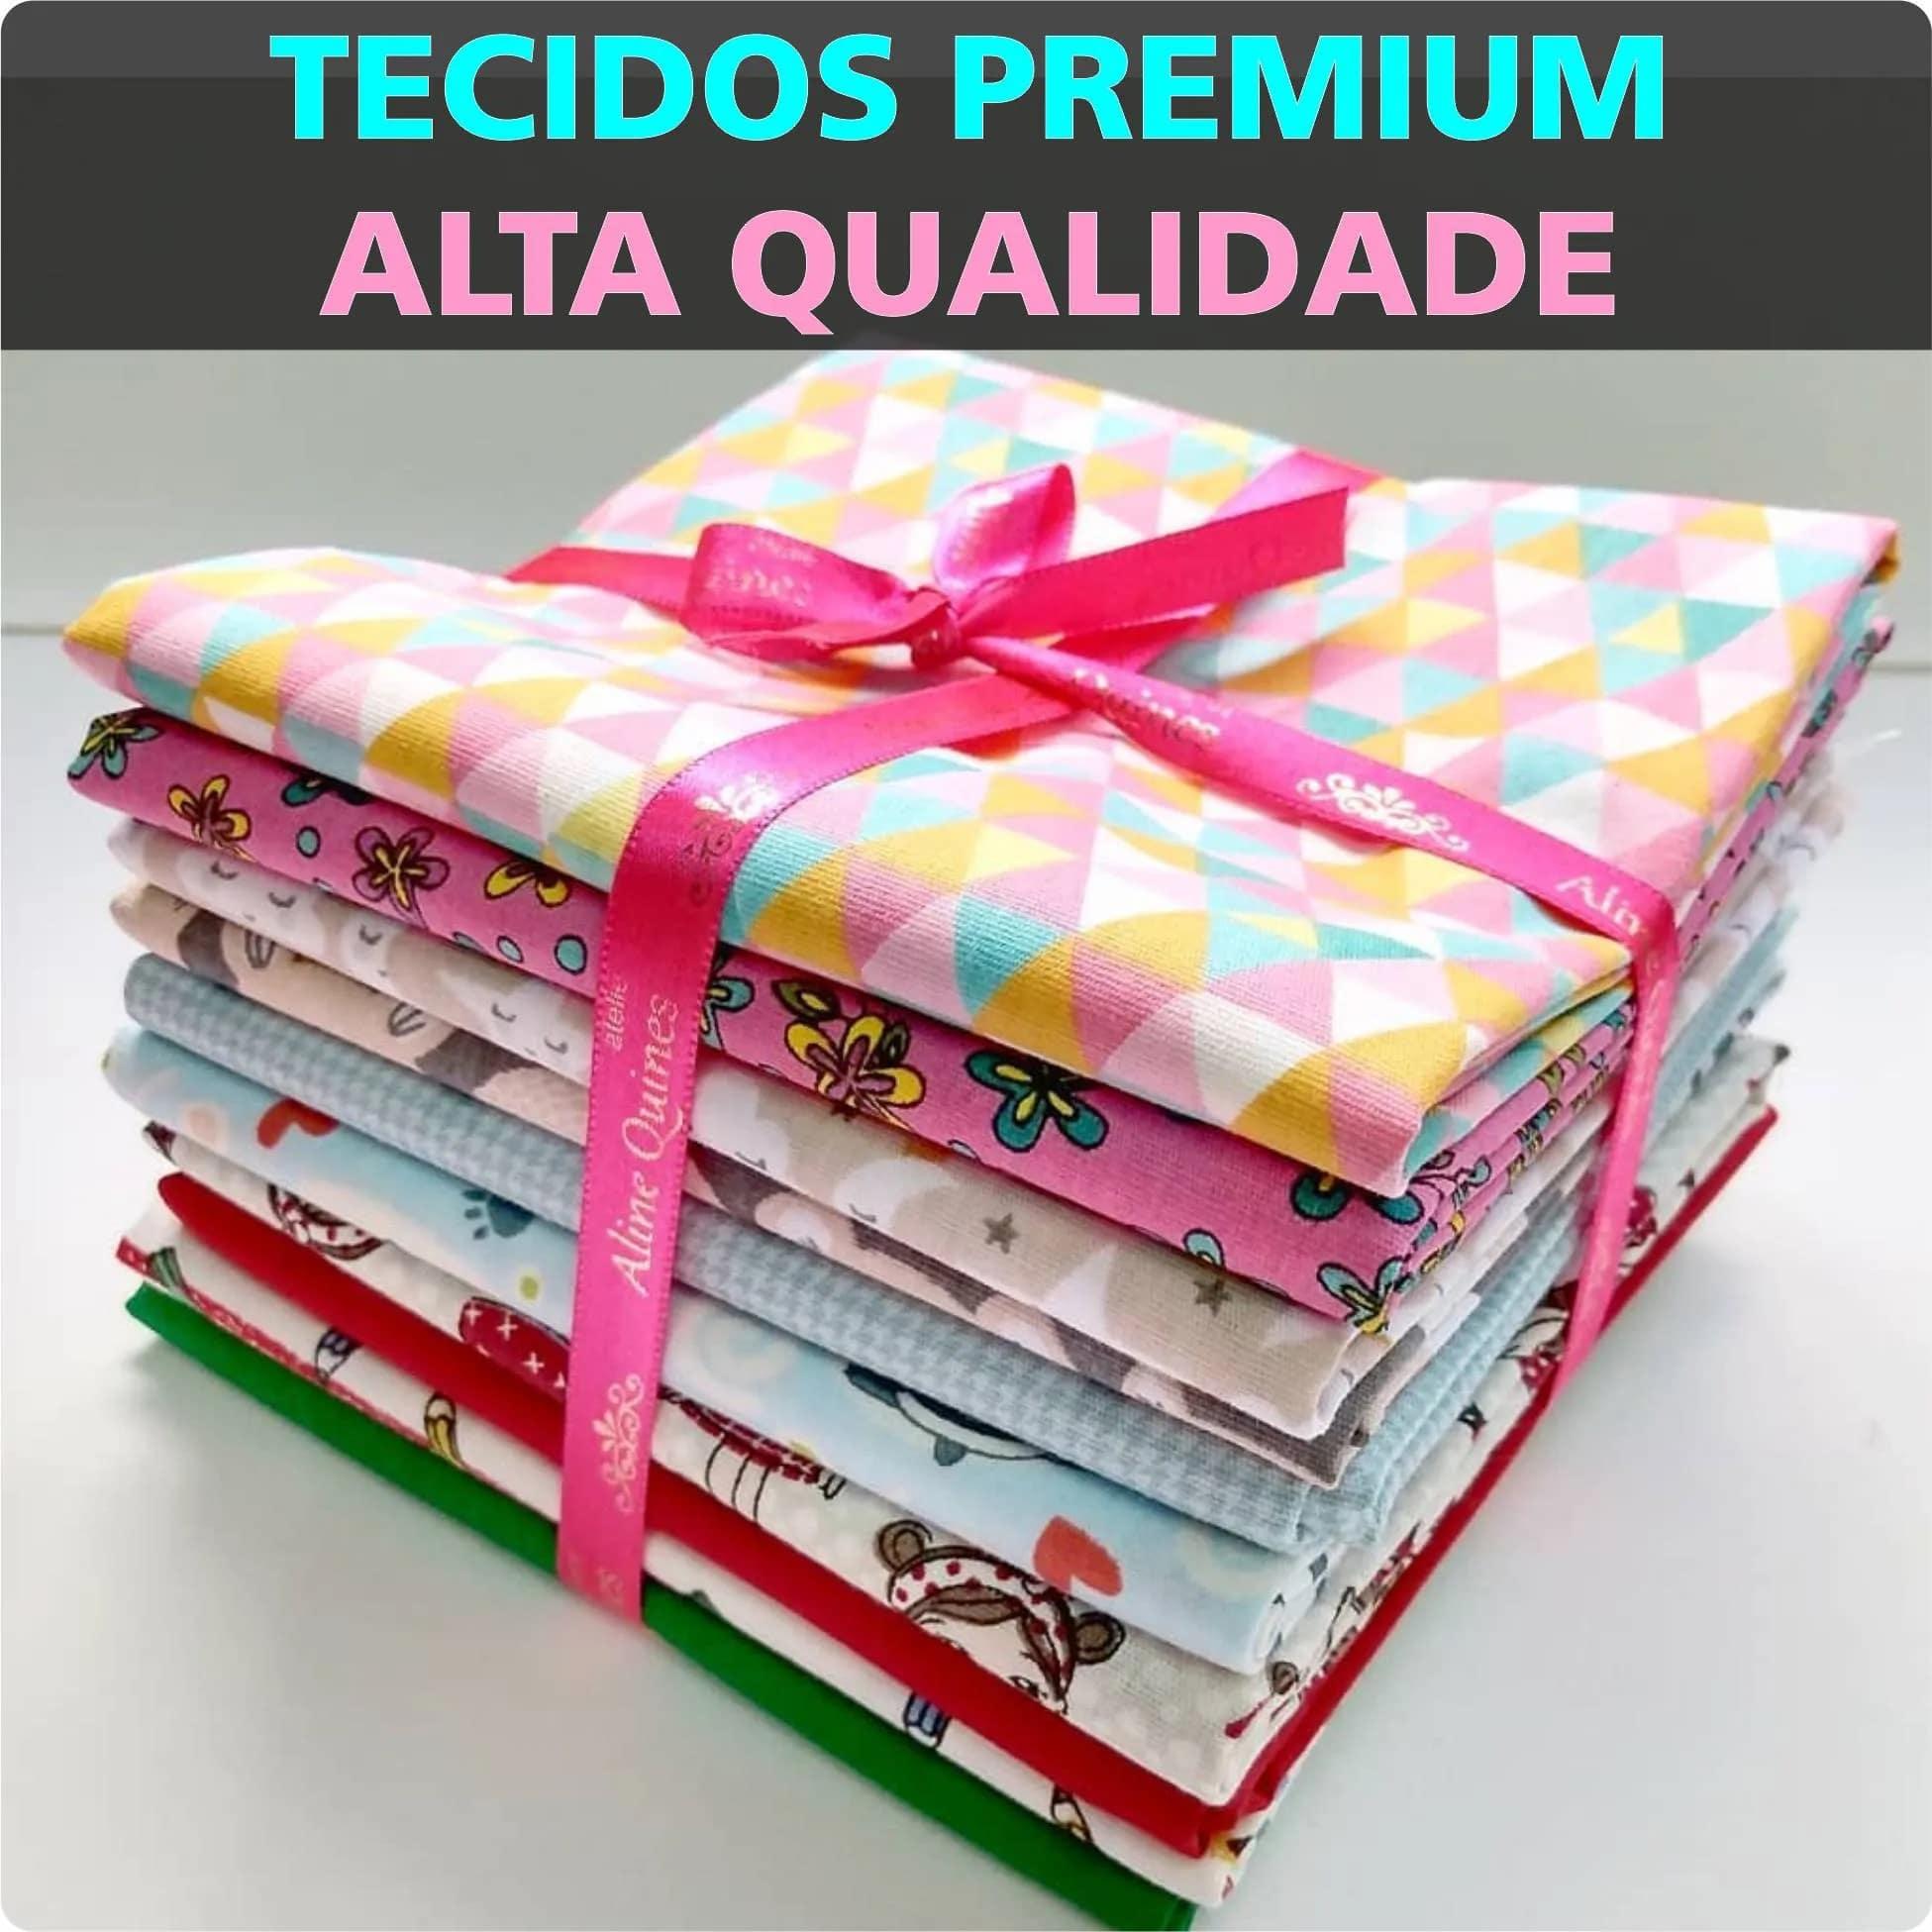 FERNANDO MALUHY - XADREZ MÉDIO VERMELHO- 25cmX150cm - Tecido Tricoline